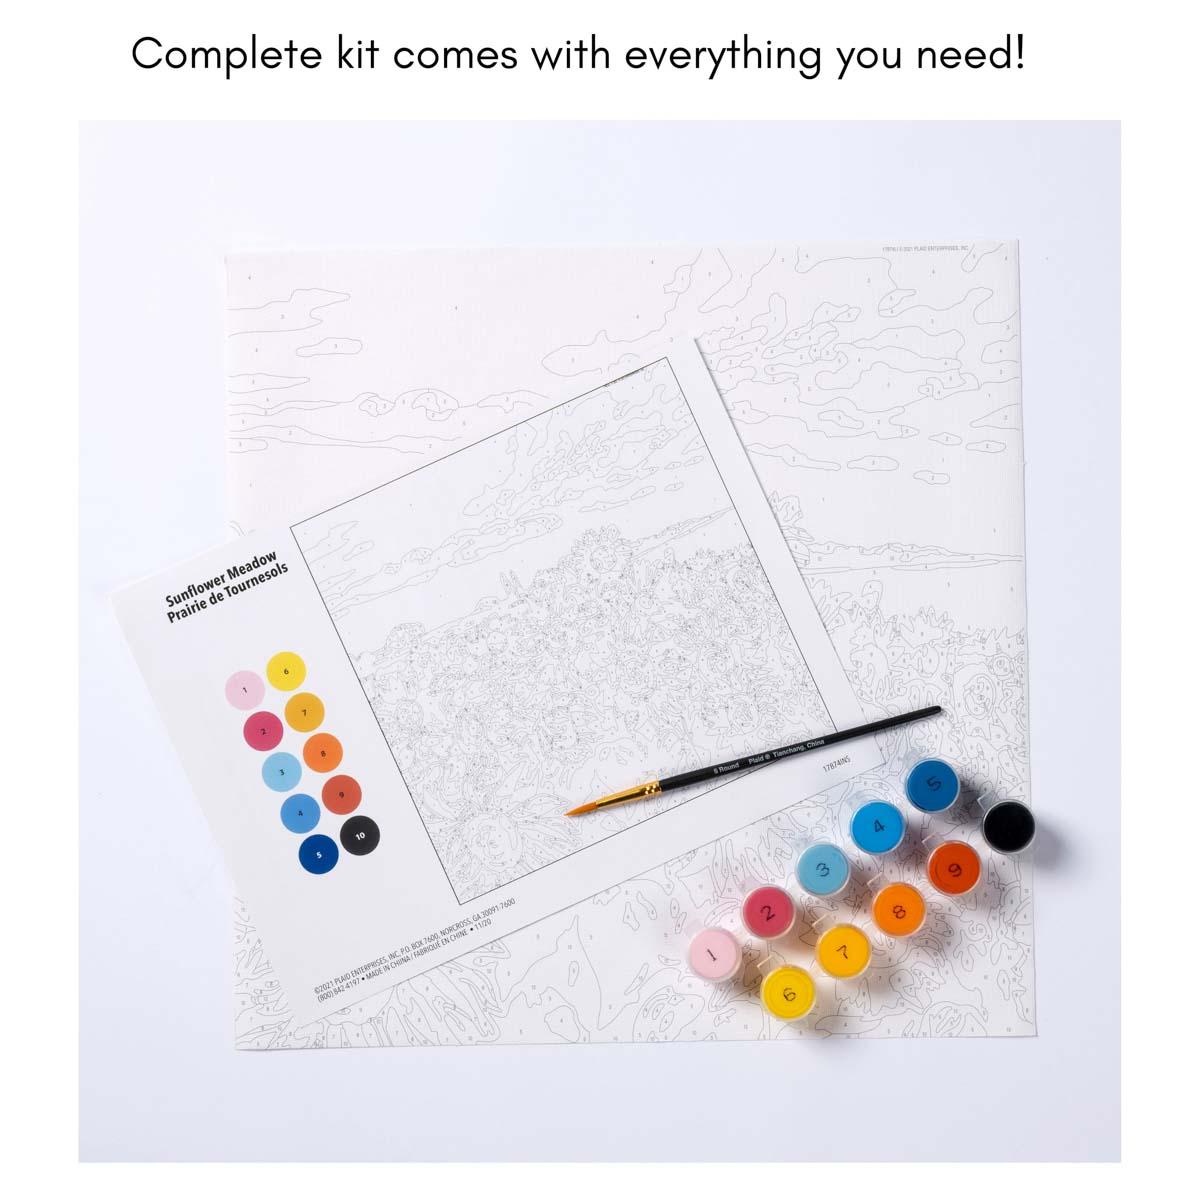 Plaid ® Let's Paint™ Modern Paint-by-Number - Poinsettia - 17917